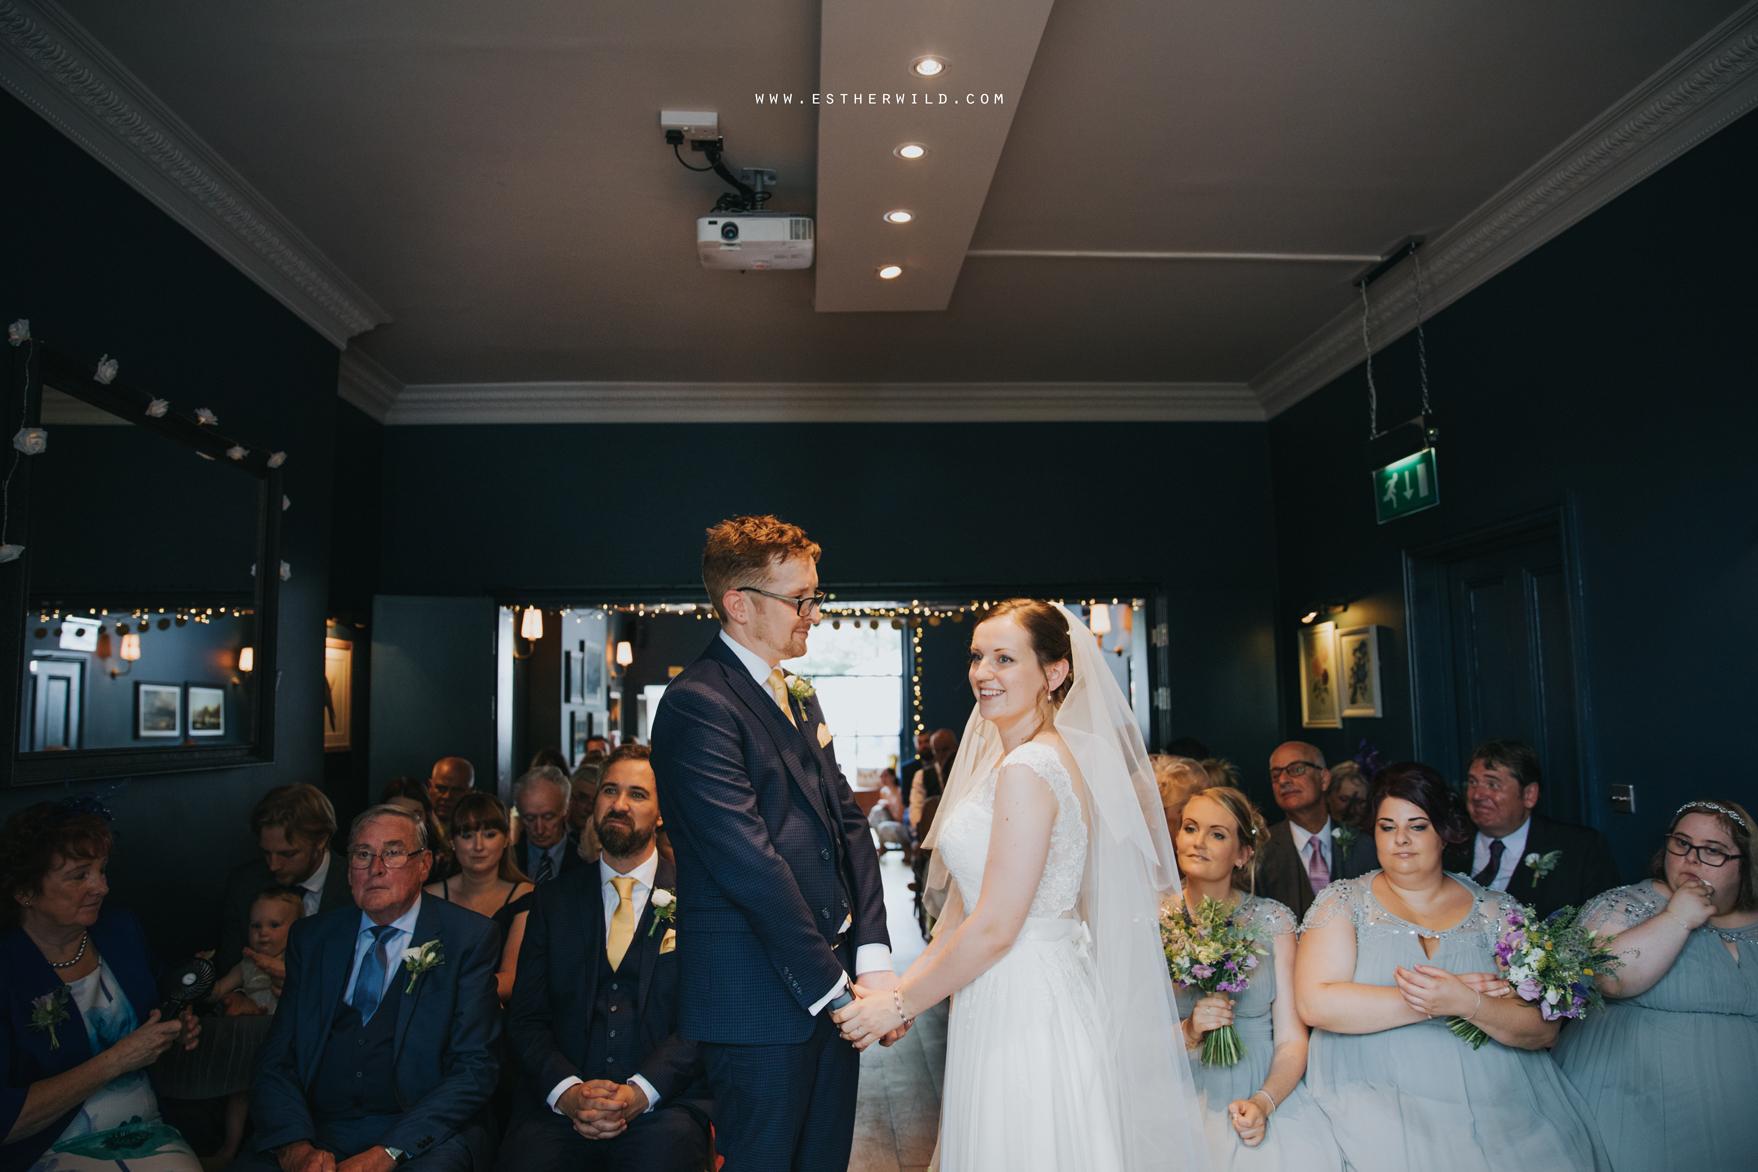 The_Georgian_Townhouse_Wedding_Norwich_Esther_Wild_Photographer_3R8A1121.jpg